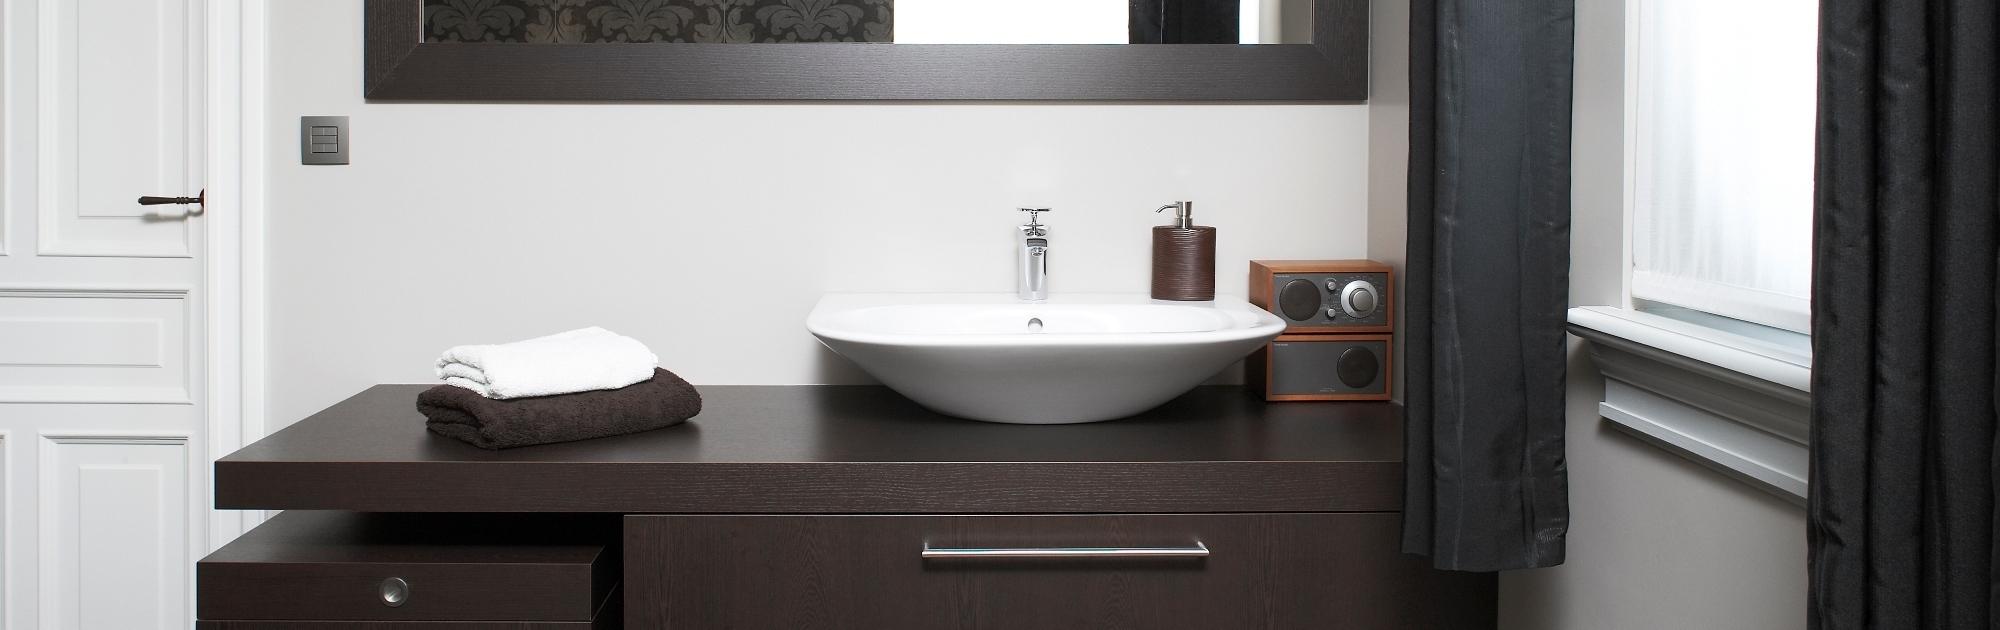 Badkamer - Badkamermeubel & kasten op maat in Geel | Elst Keukens